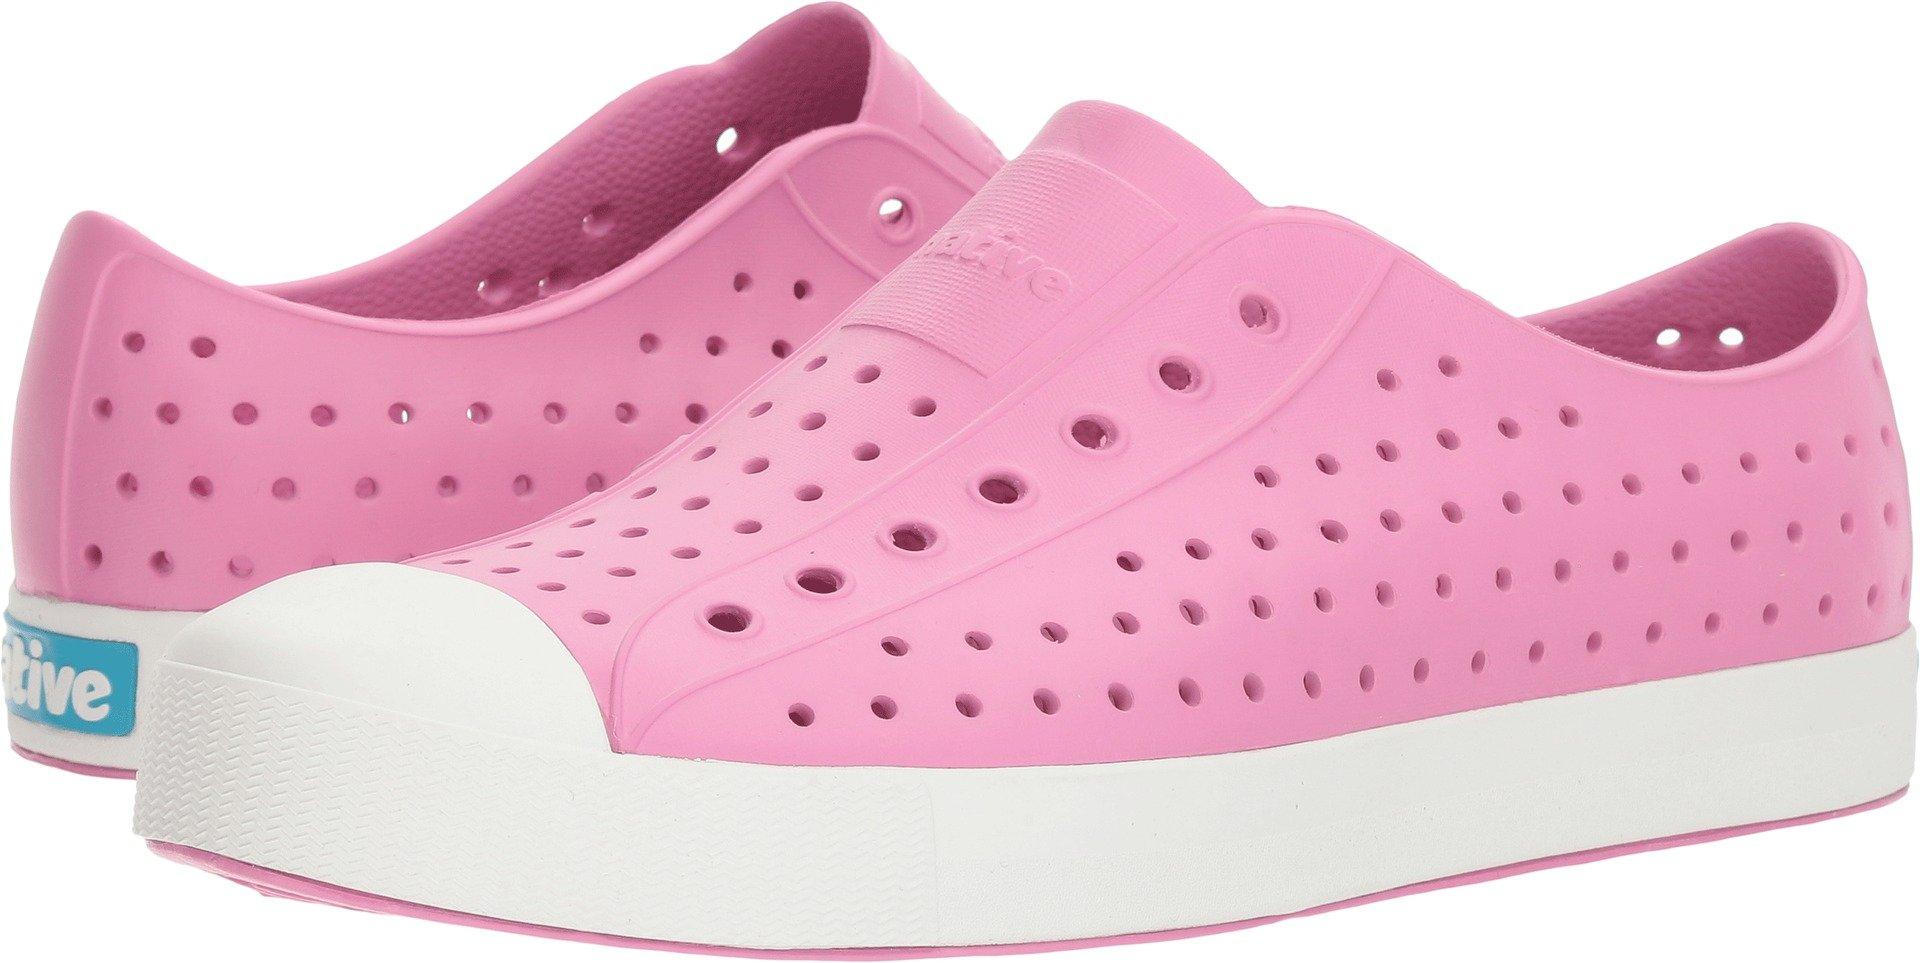 Native Shoes Jefferson Water Shoe, Malibu Pink/Shell White, 12 Men's M US